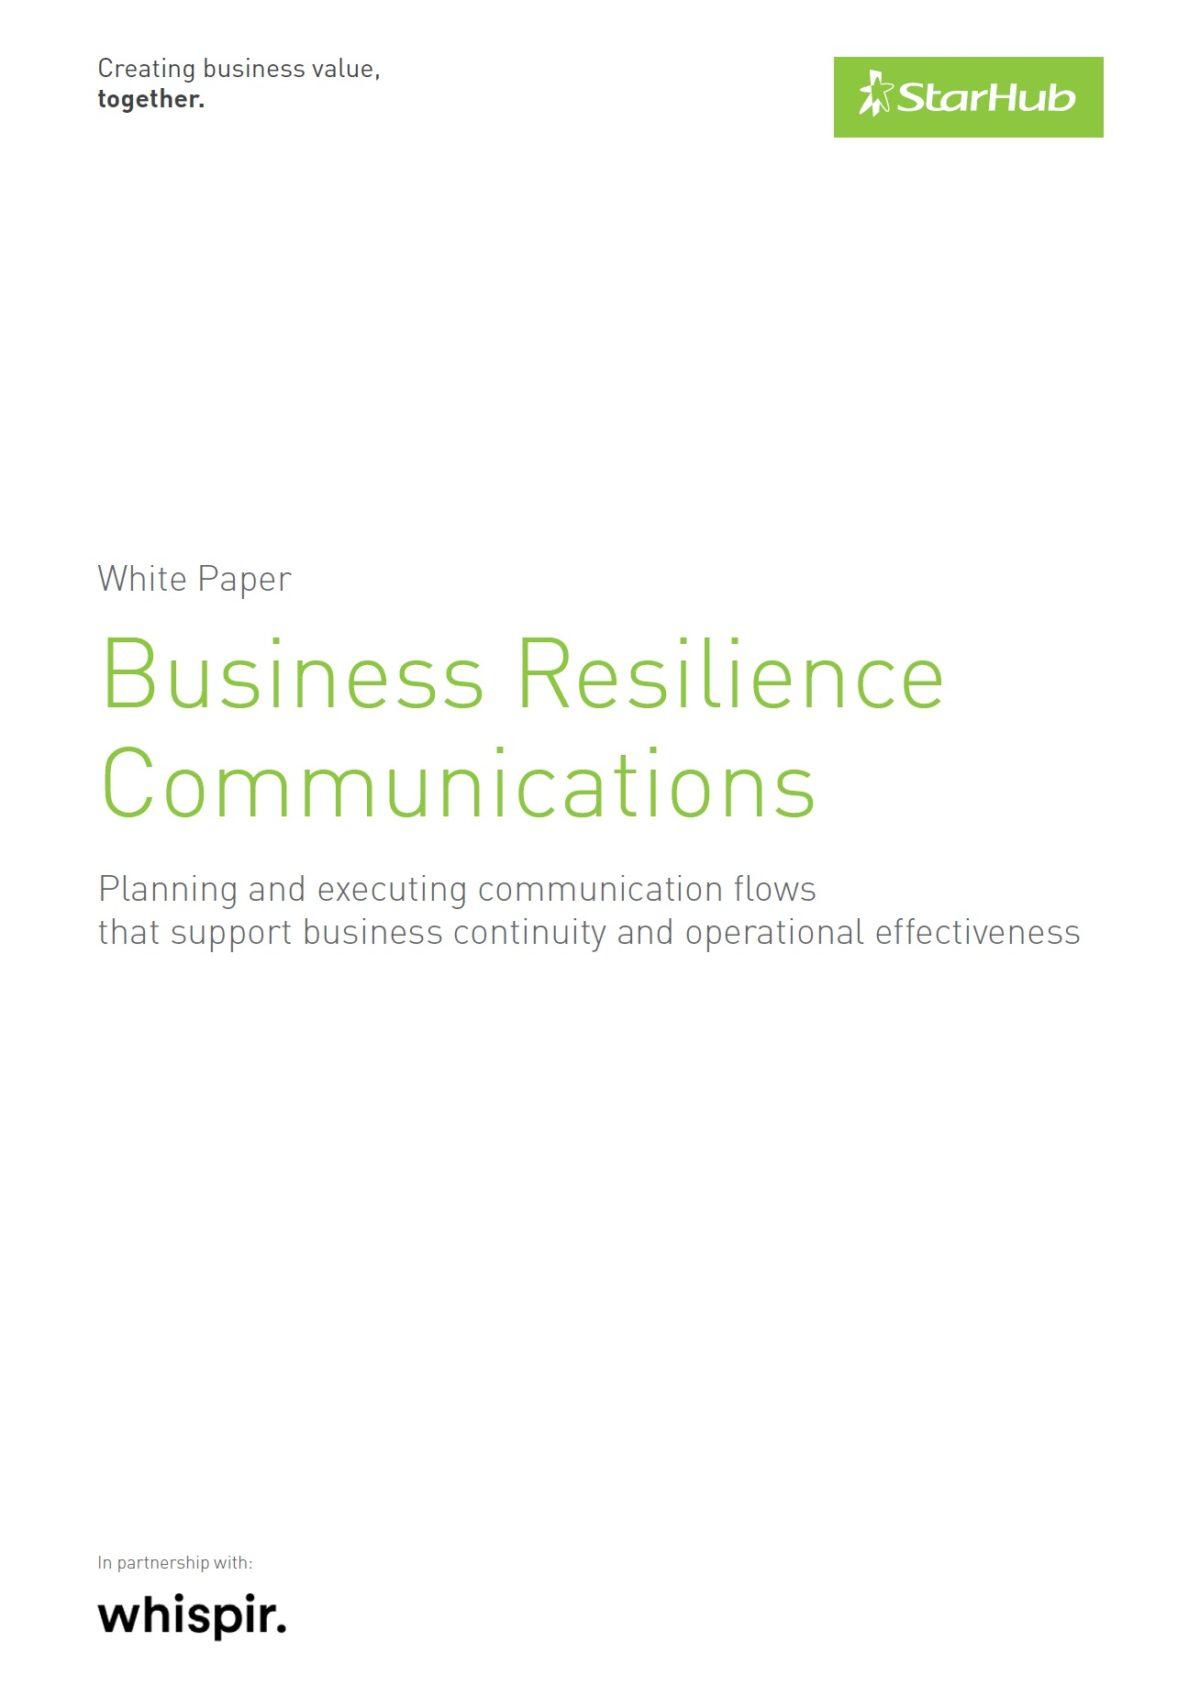 StarHub (SG) Whitepaper - Business Resilience Communications